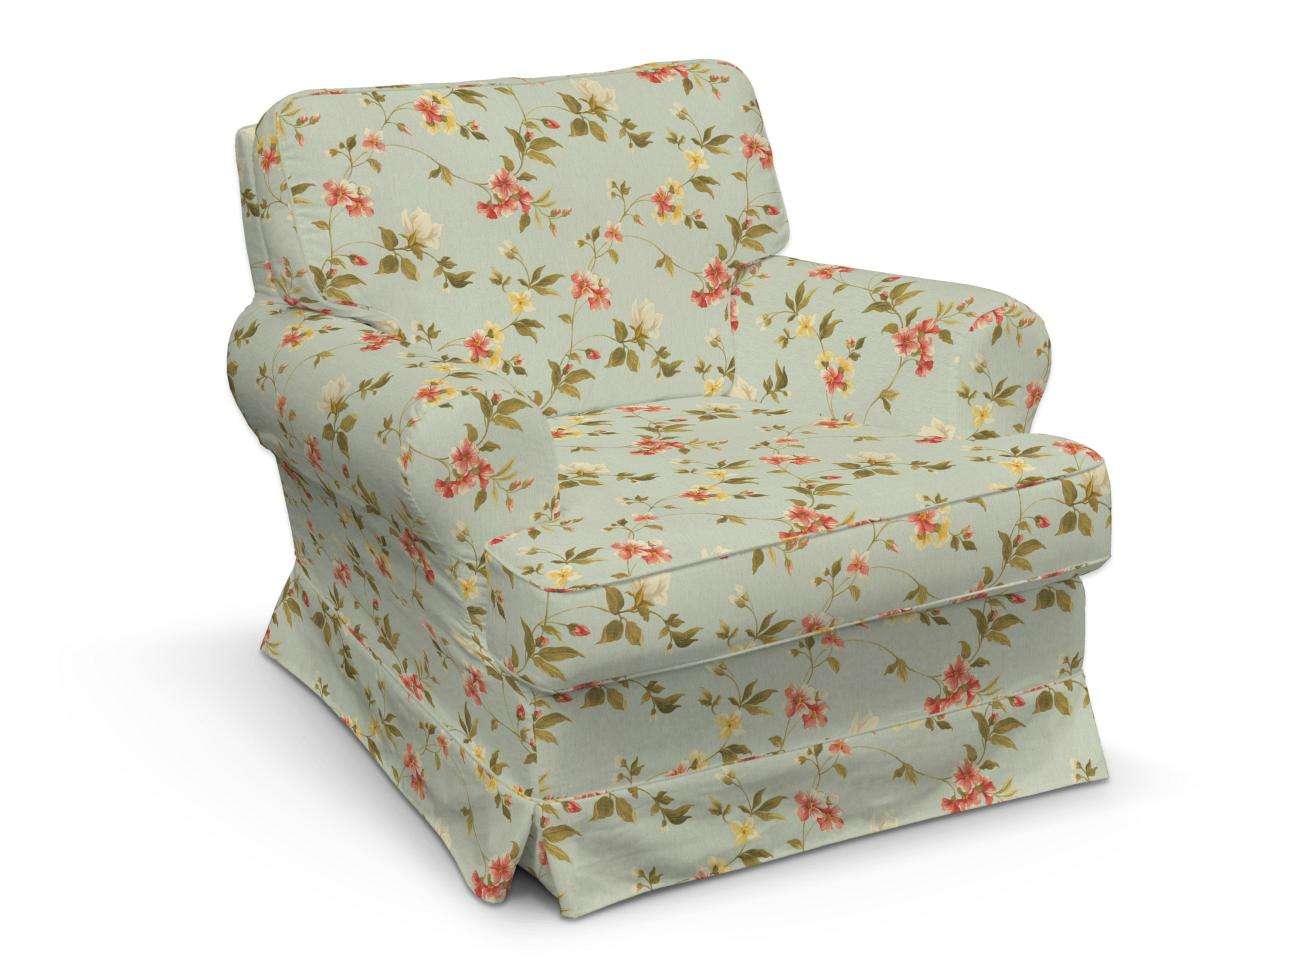 Barkaby Sesselbezug von der Kollektion Londres, Stoff: 124-65